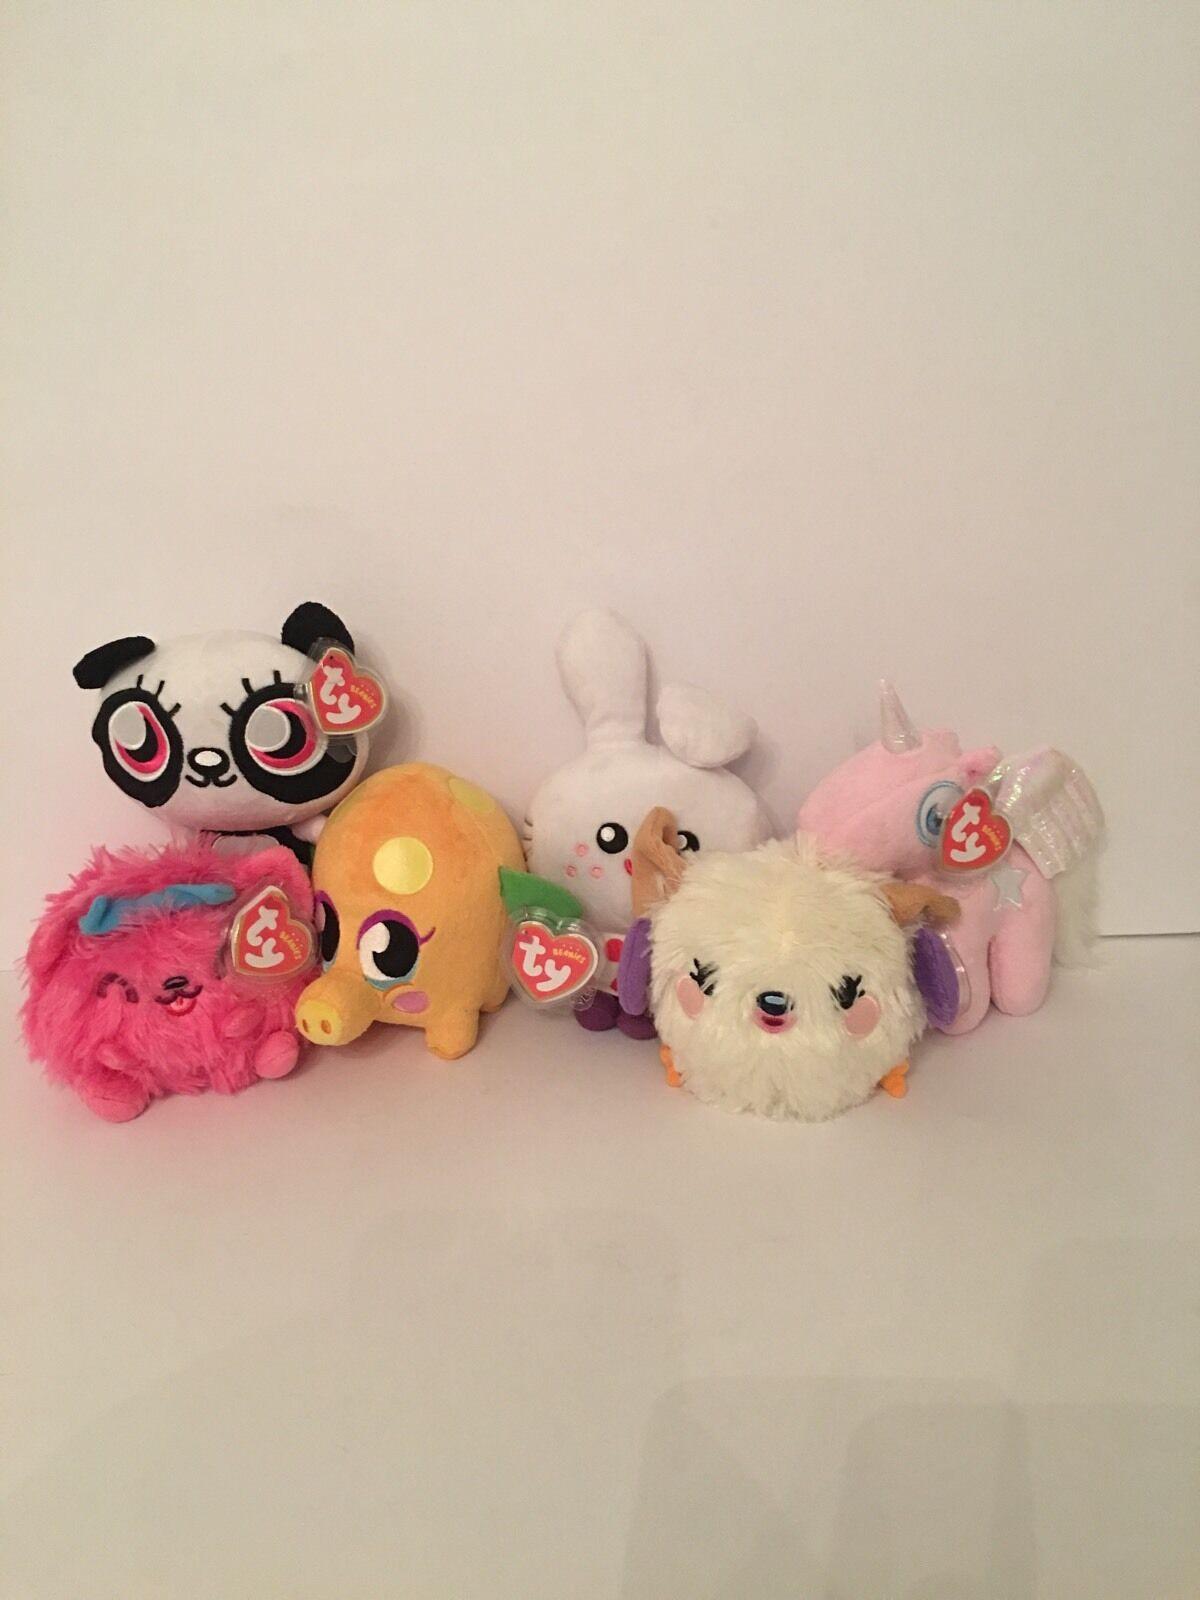 Ty Beanie Babies - Mr Snoodle, Angel, Honey, Purdy, ShiShi & Squidge